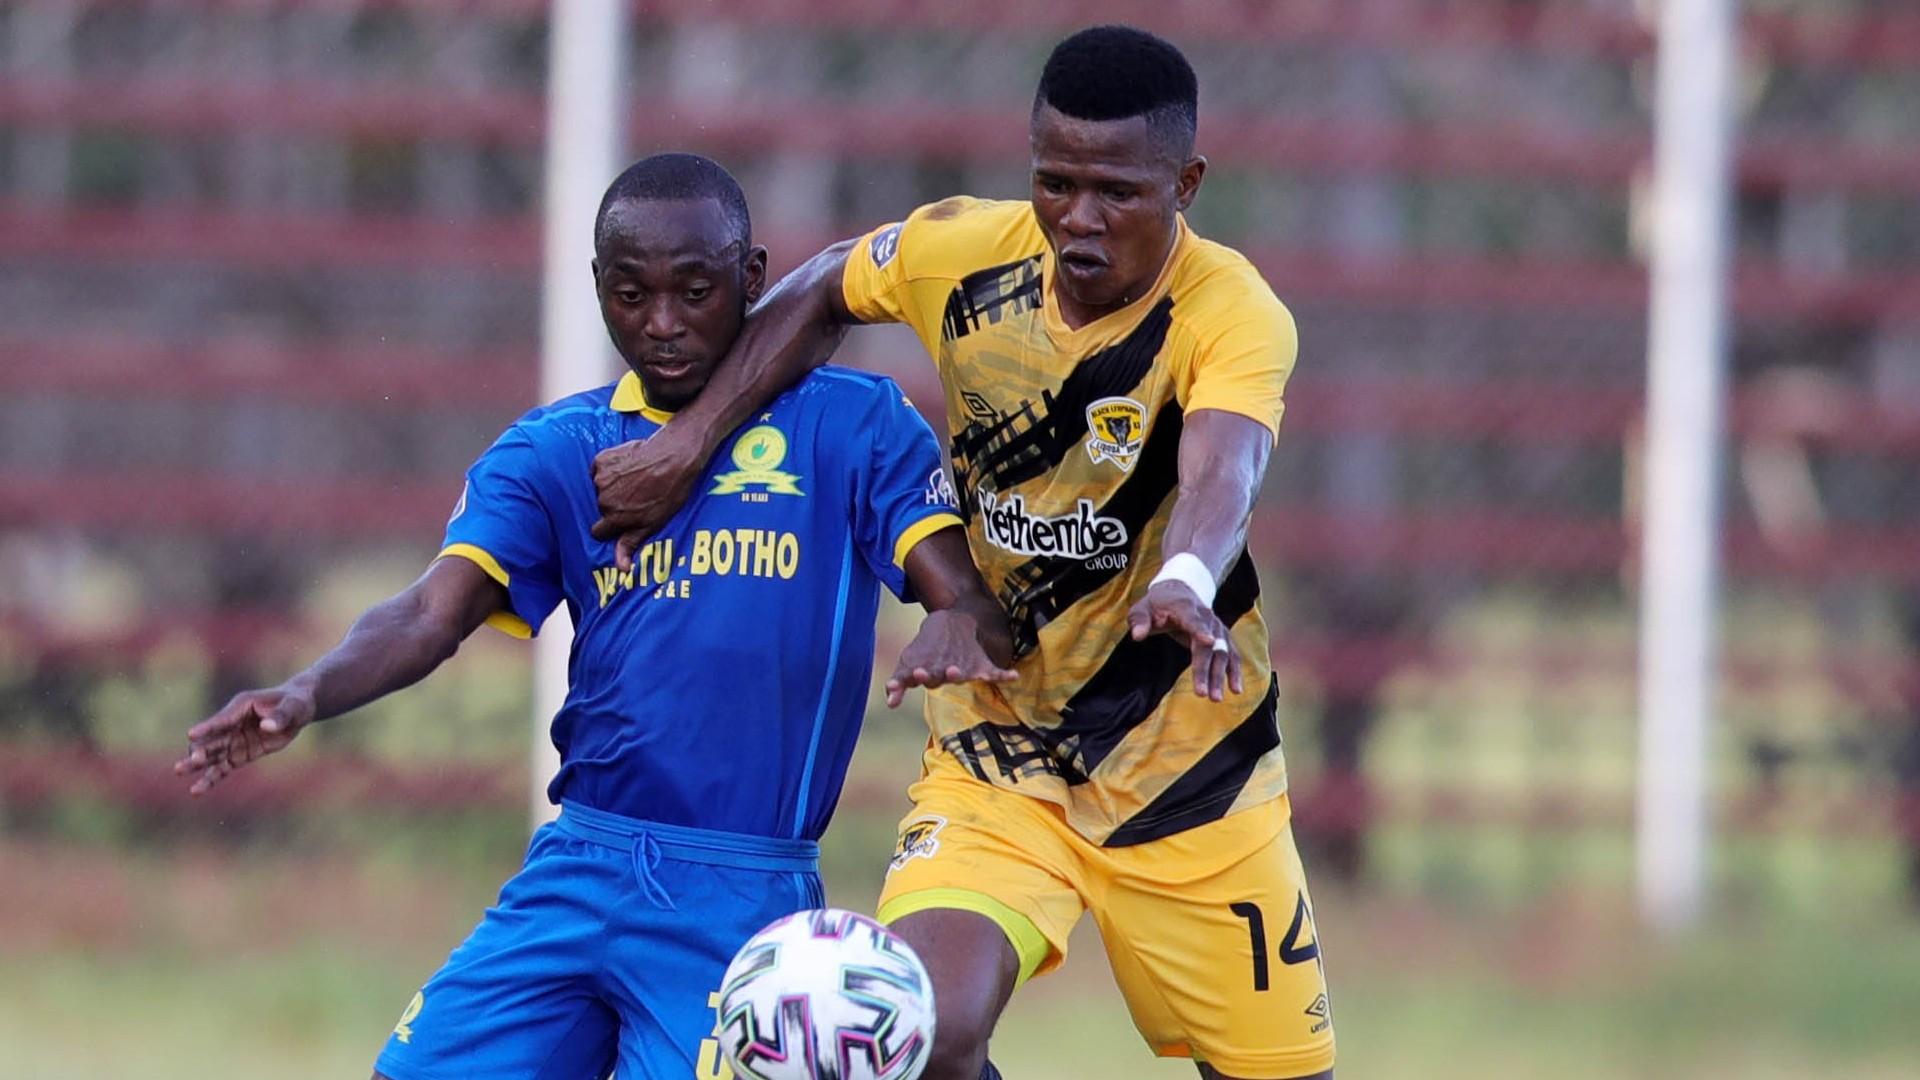 Mokwena commends Mamelodi Sundowns mentality ahead of Chippa United test